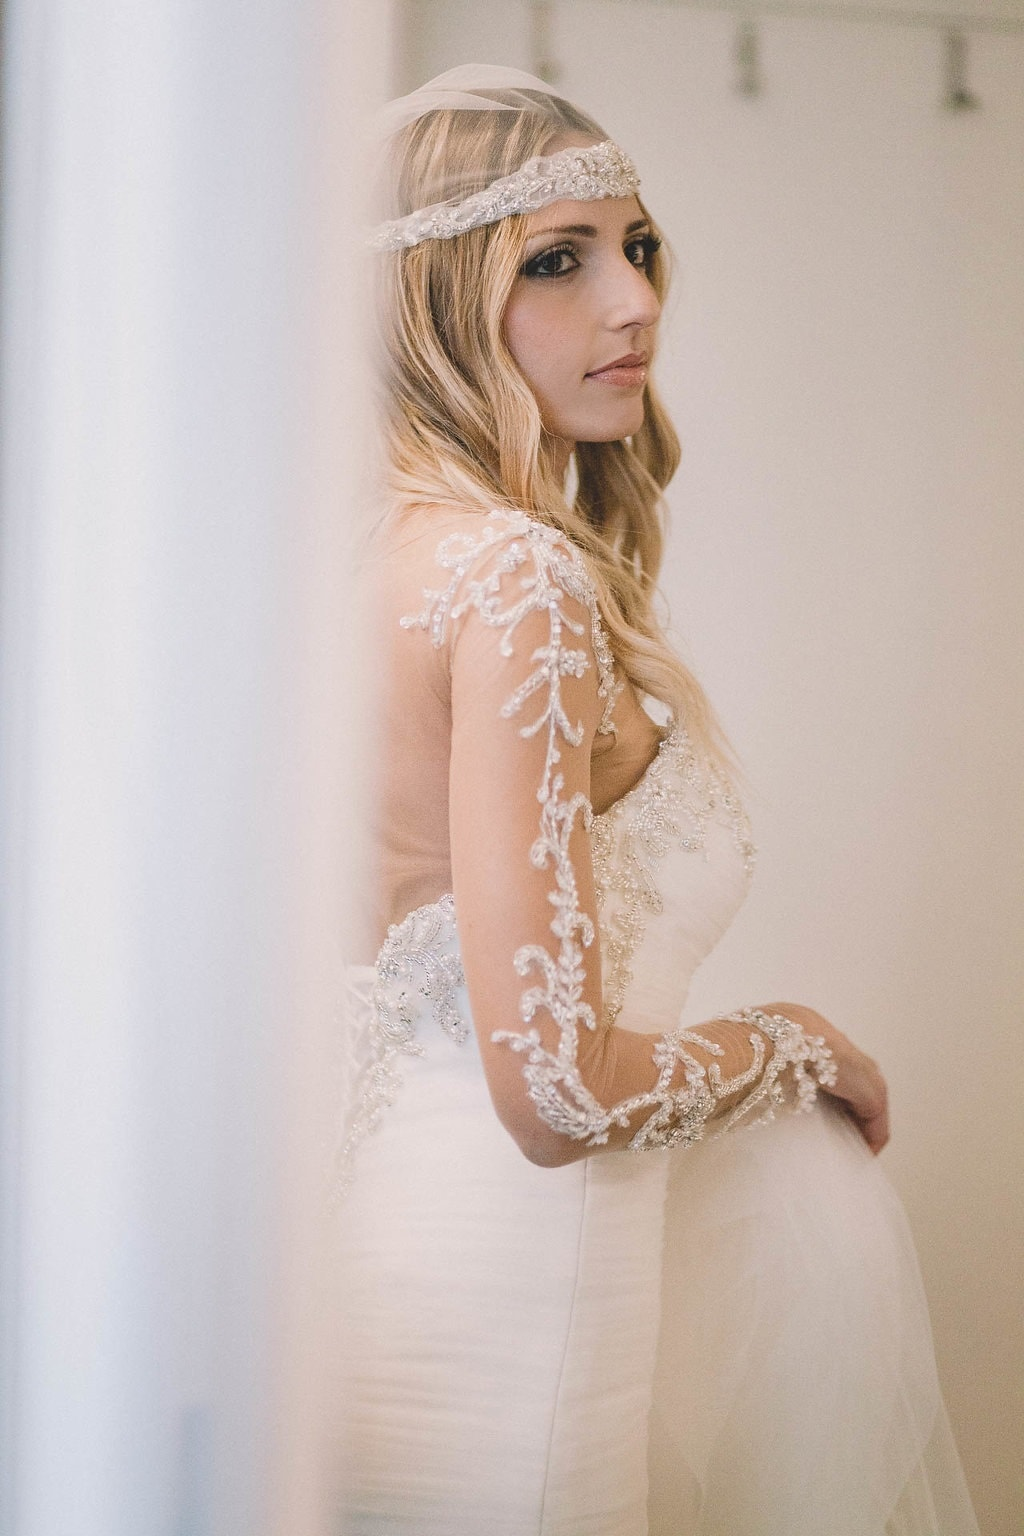 La Bottega del Sogno Wedding Planner Italy - Valued Member of Weddings Abroad Guide Supplier Directory